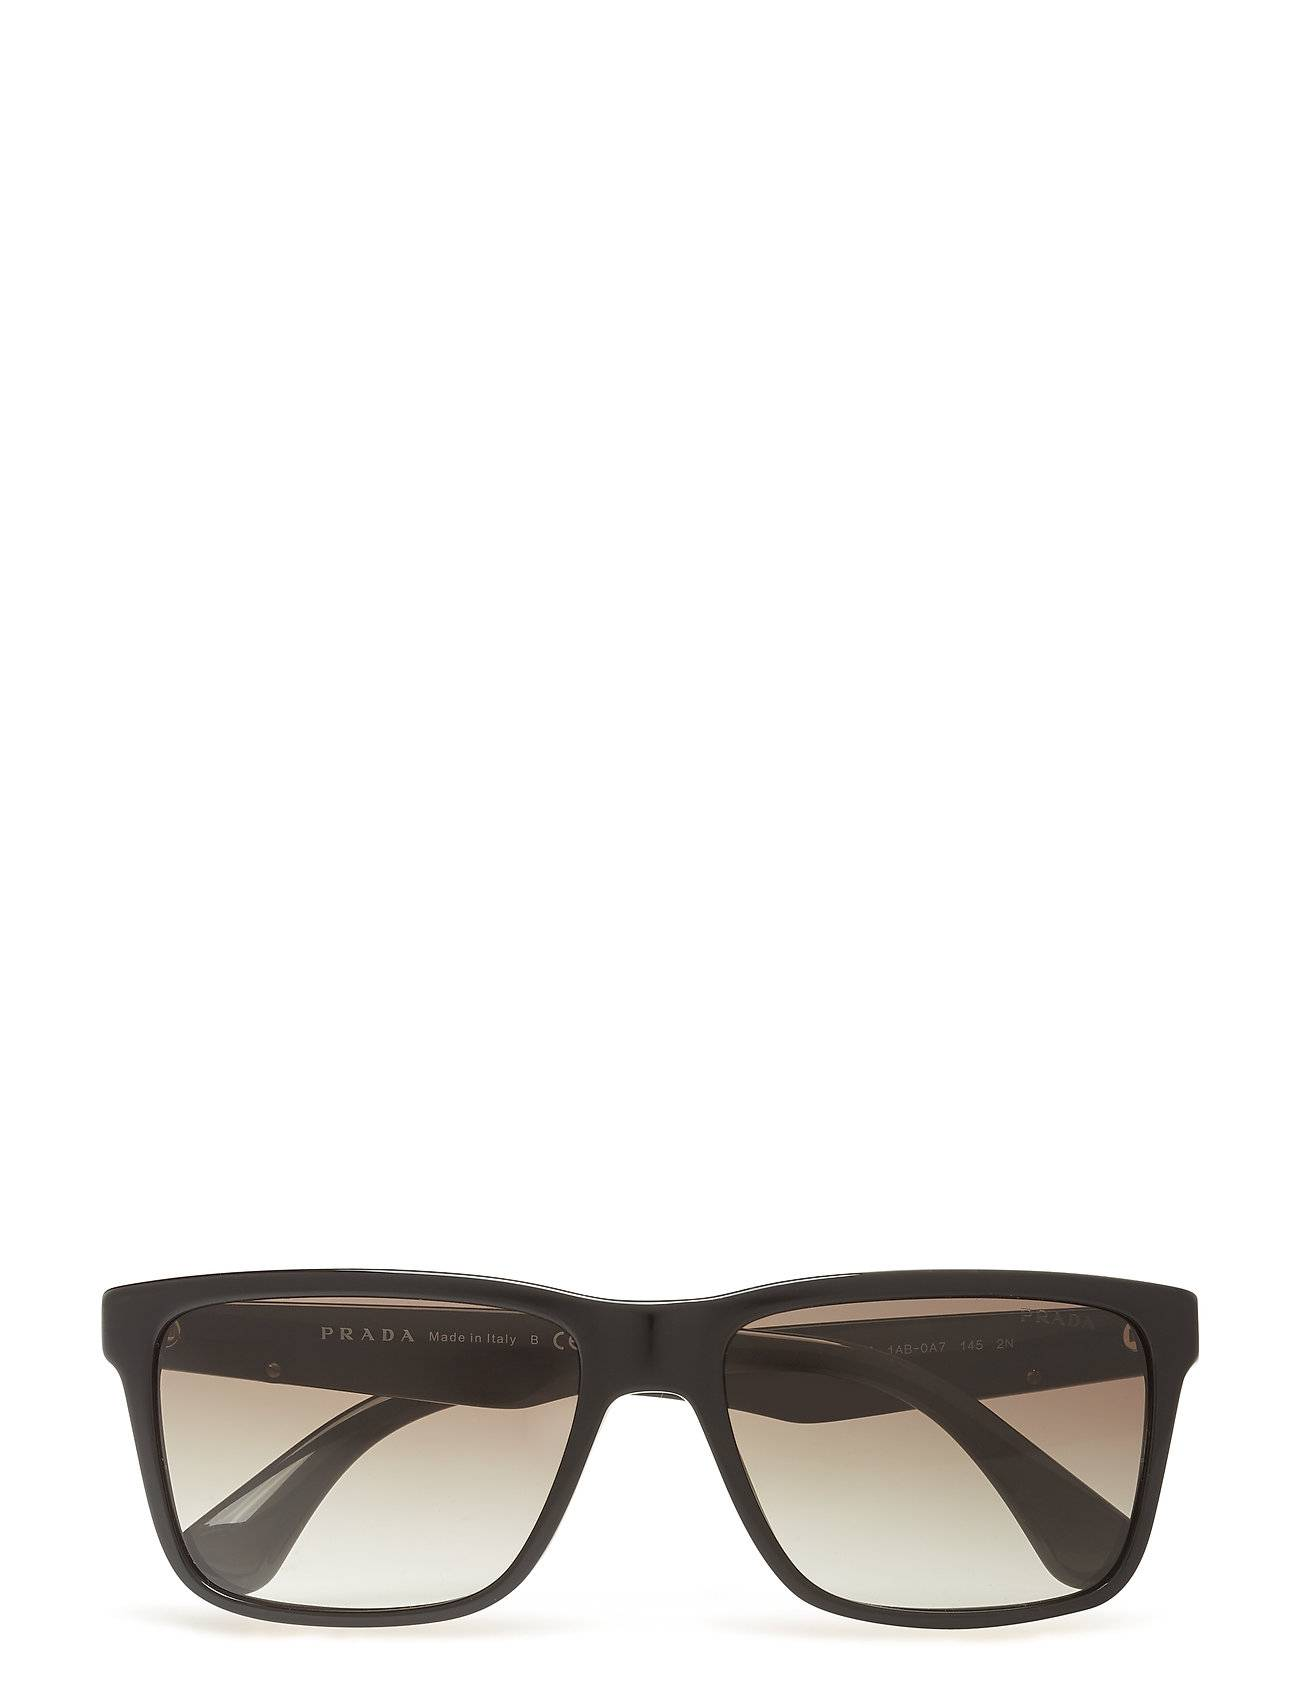 Image of Prada Sport Sunglasses 0pr 19ss Wayfarer Aurinkolasit Musta